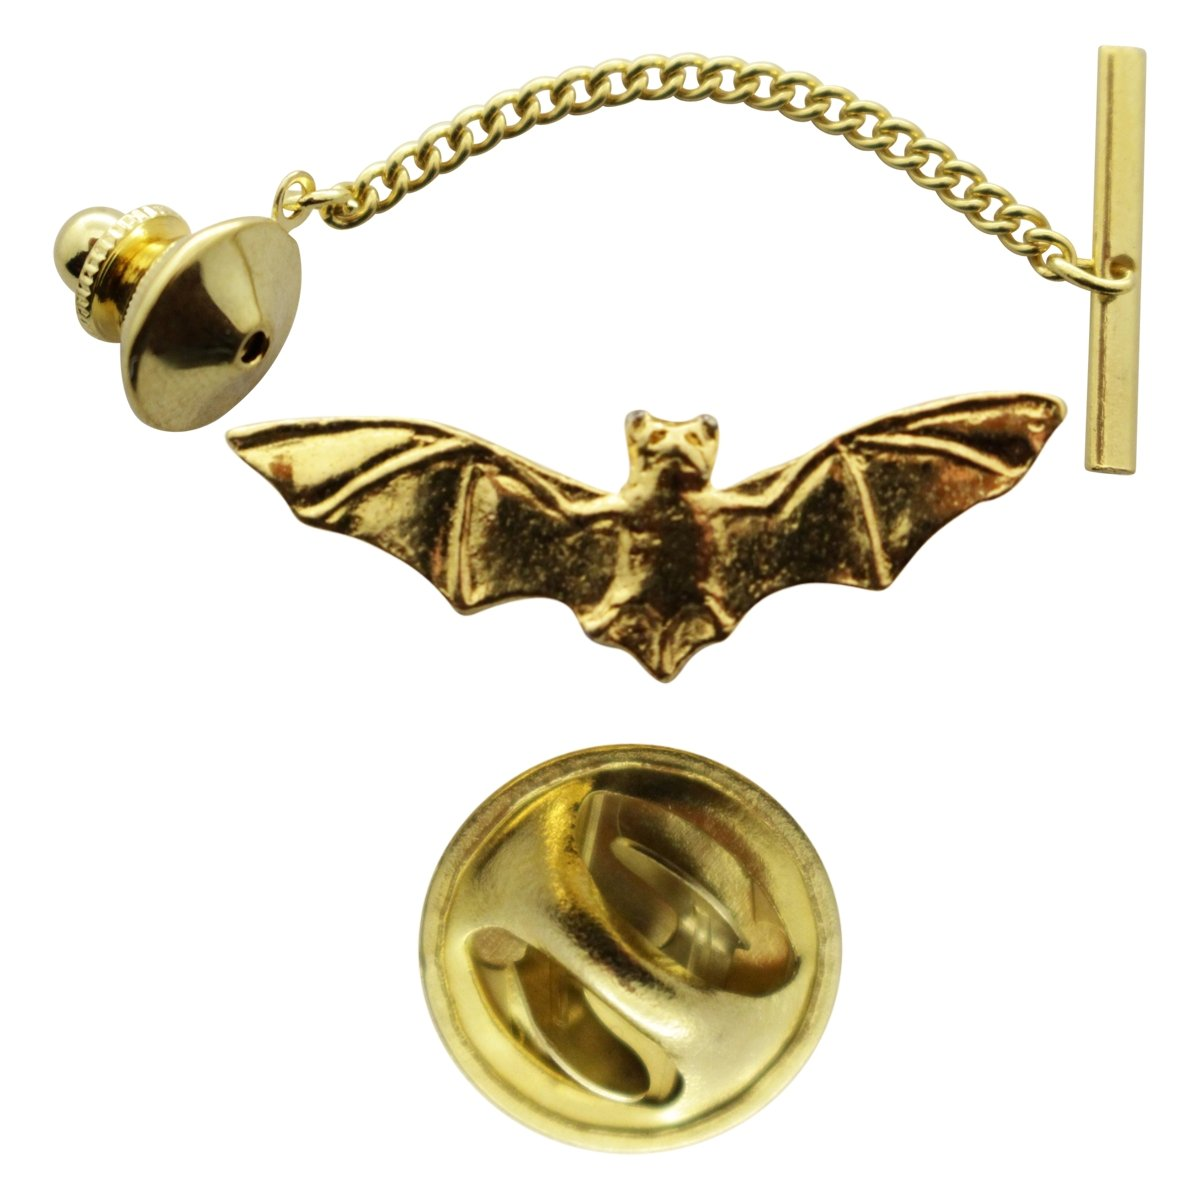 Bat Tie Tack ~ 24K Gold ~ Tie Tack or Pin ~ Sarah's Treats & Treasures by Sarah's Treats & Treasures (Image #1)